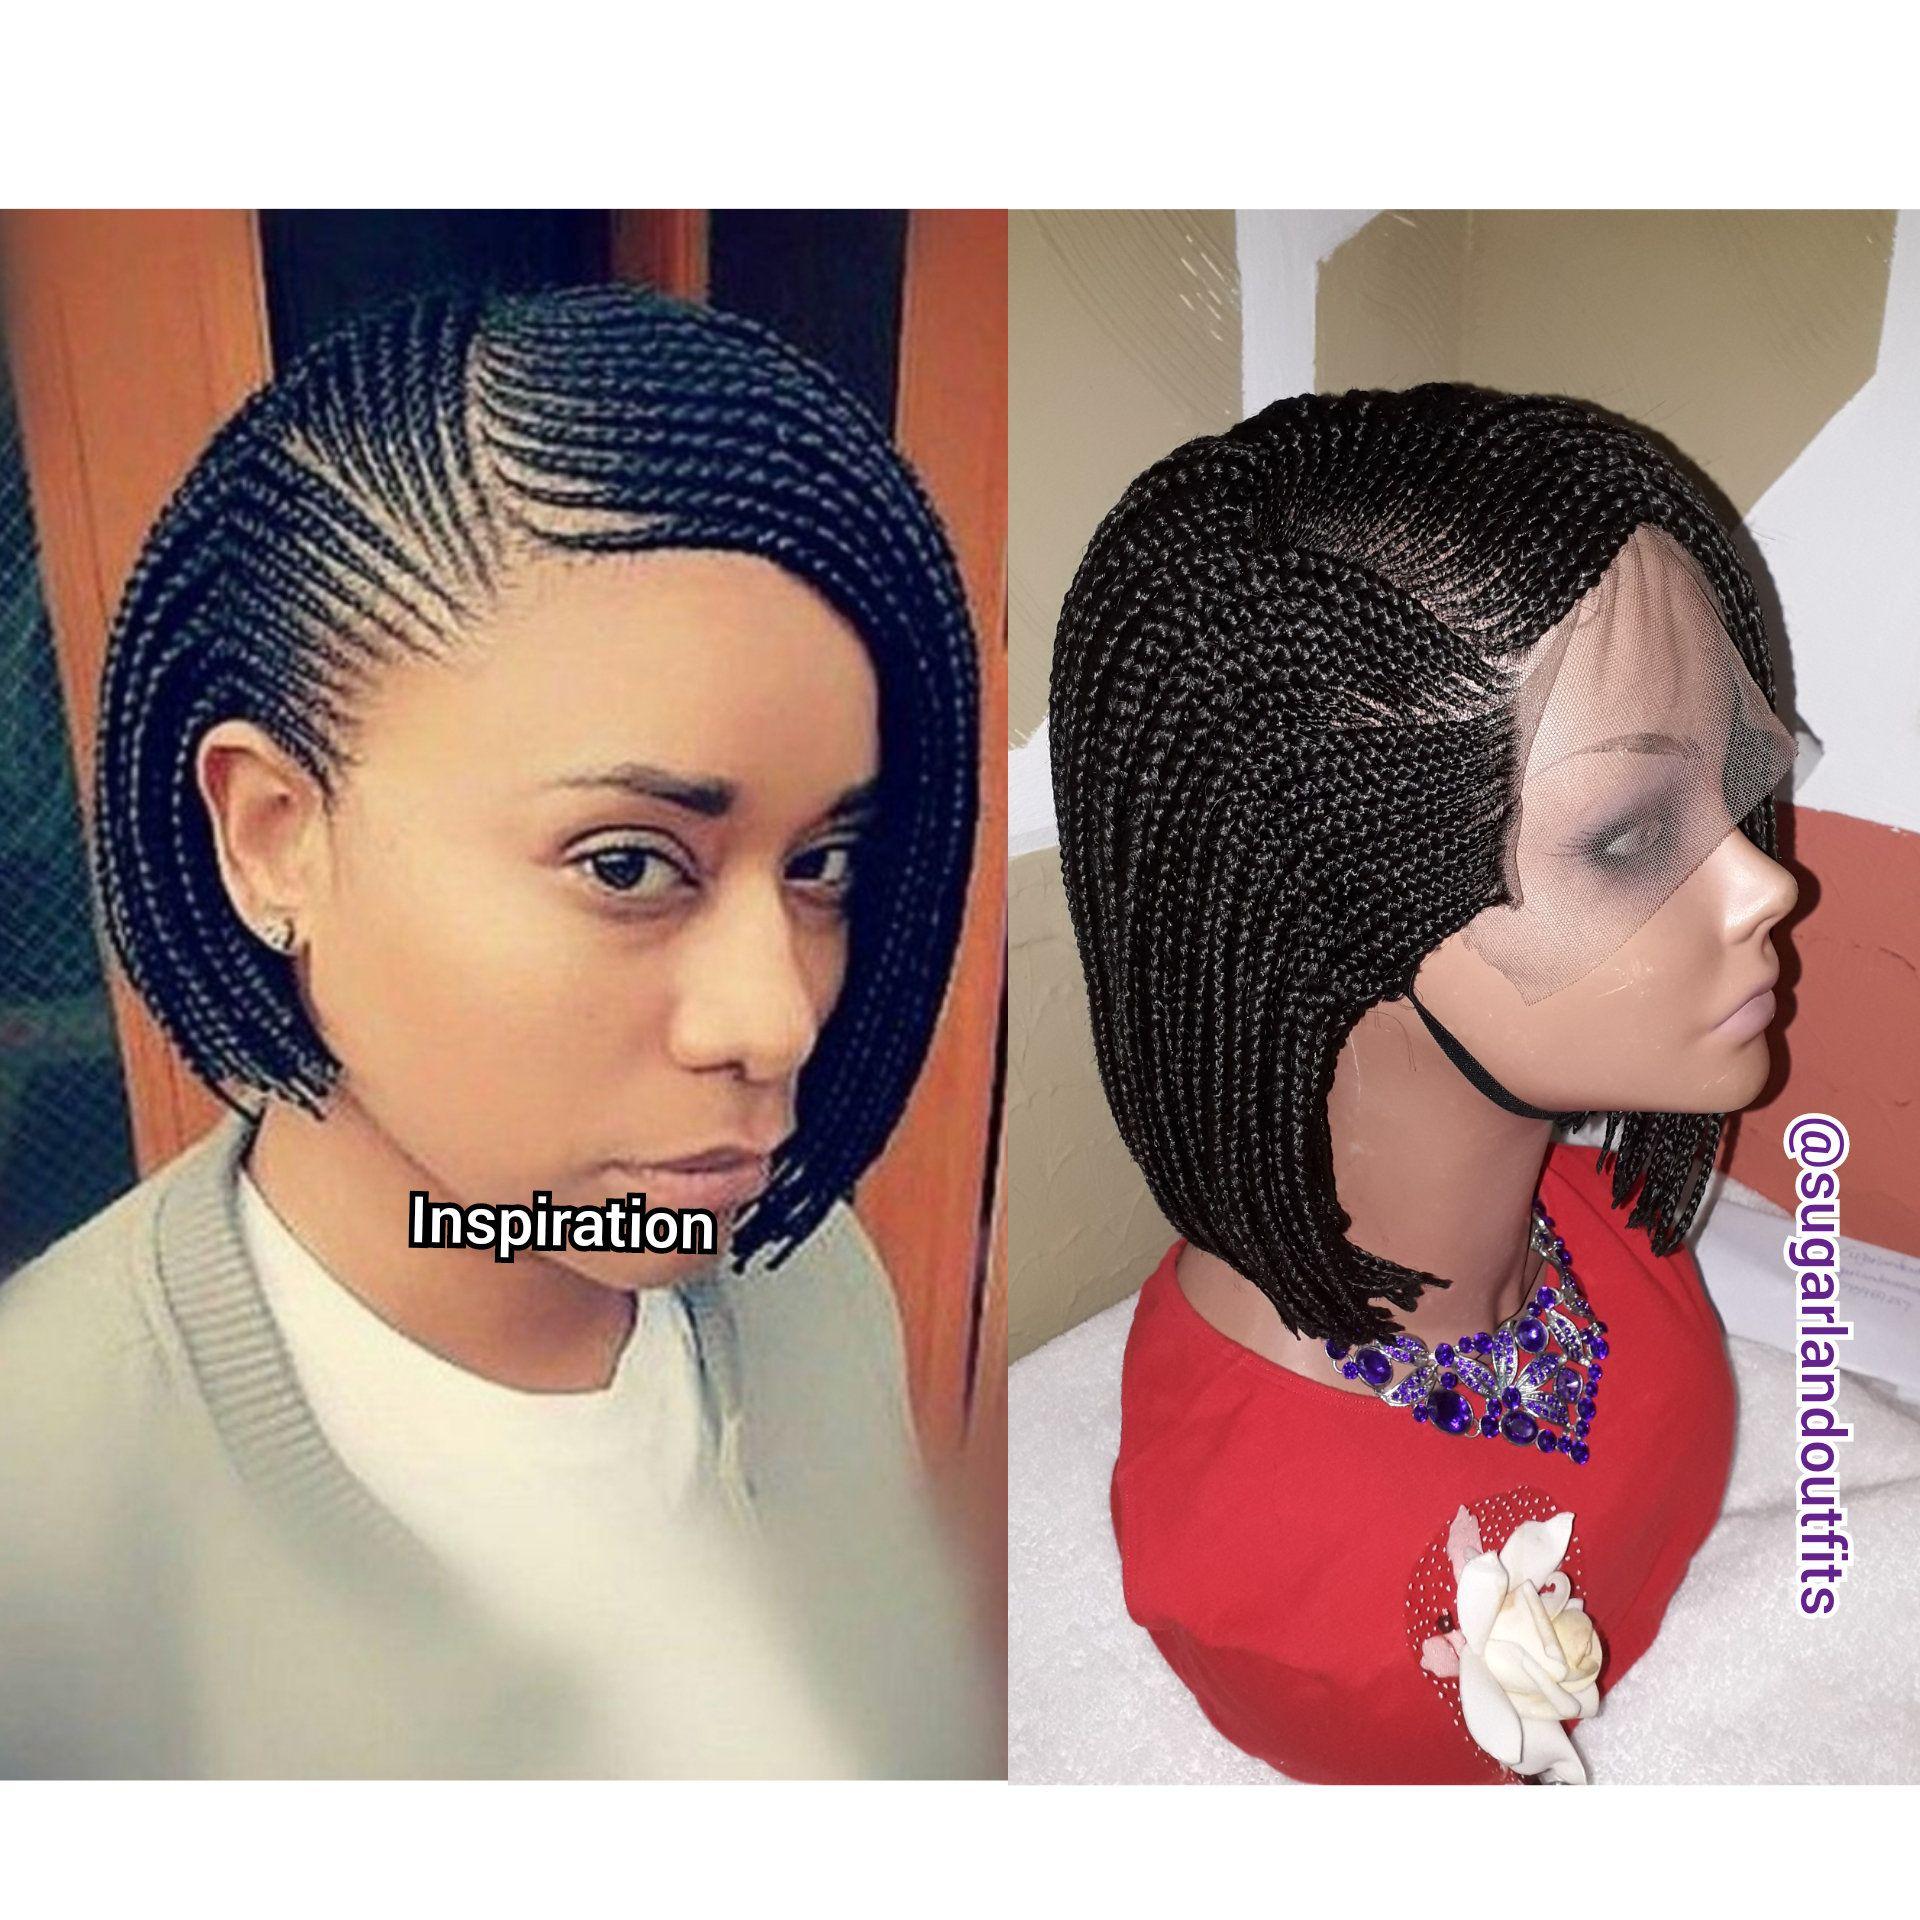 Side Ways Cornrow Weaving Wig Box Braids Short Braids Etsy Braids For Black Hair Short Braids Cornrows Braids For Black Women